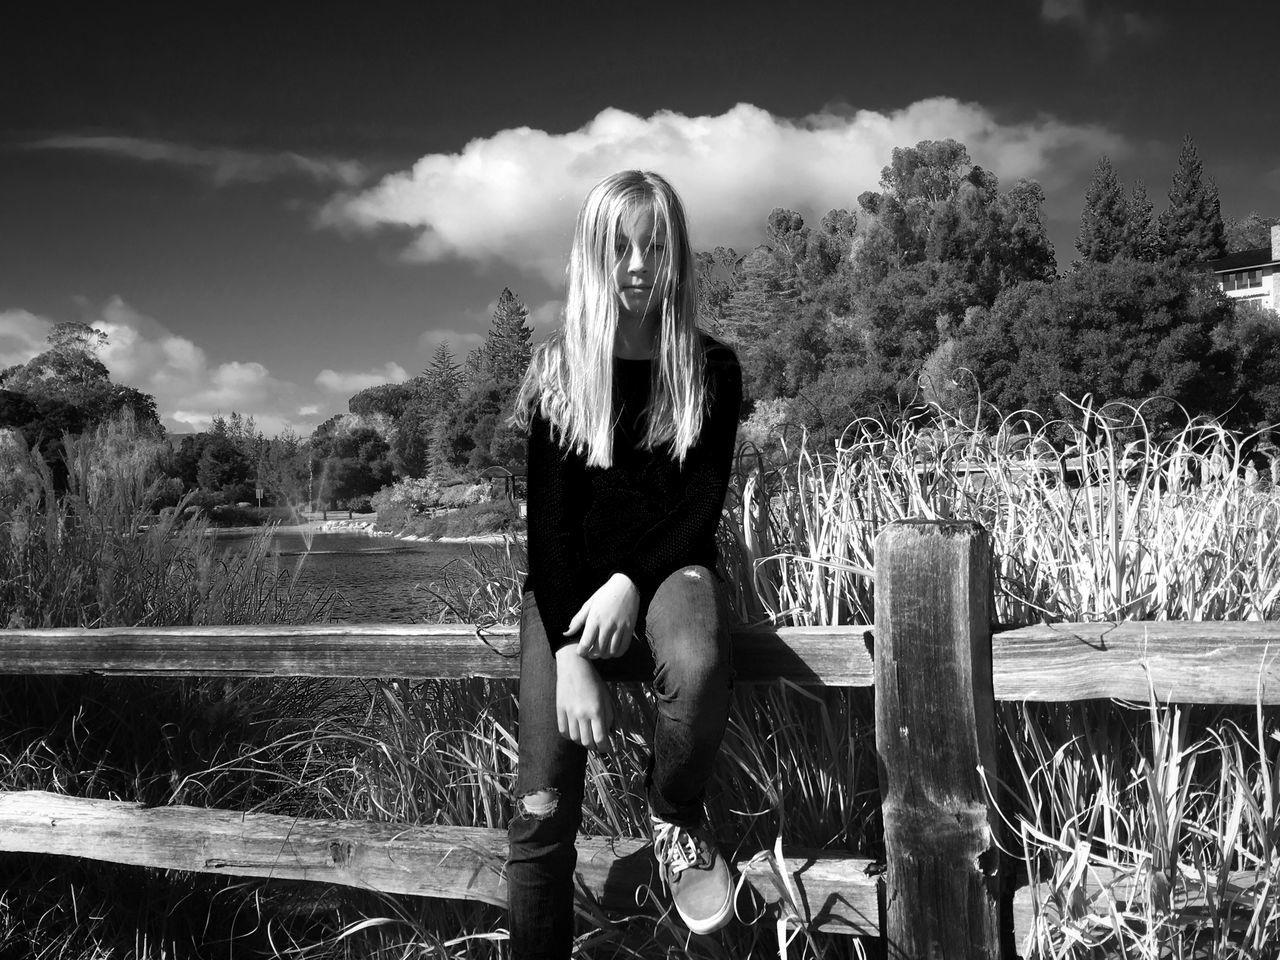 Girl sitting on railing against trees